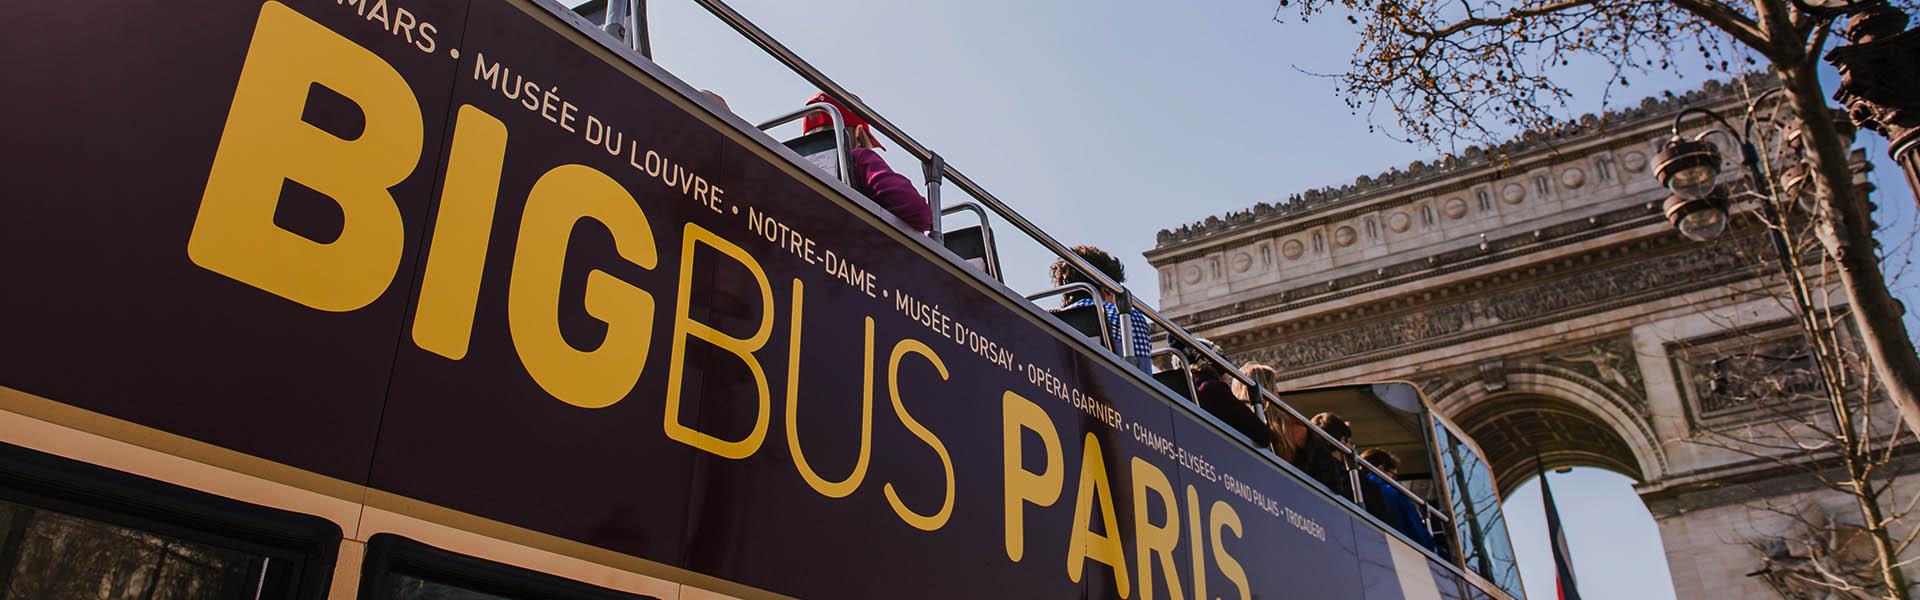 Tour de Big Bus cerca del Arco de Triunfo